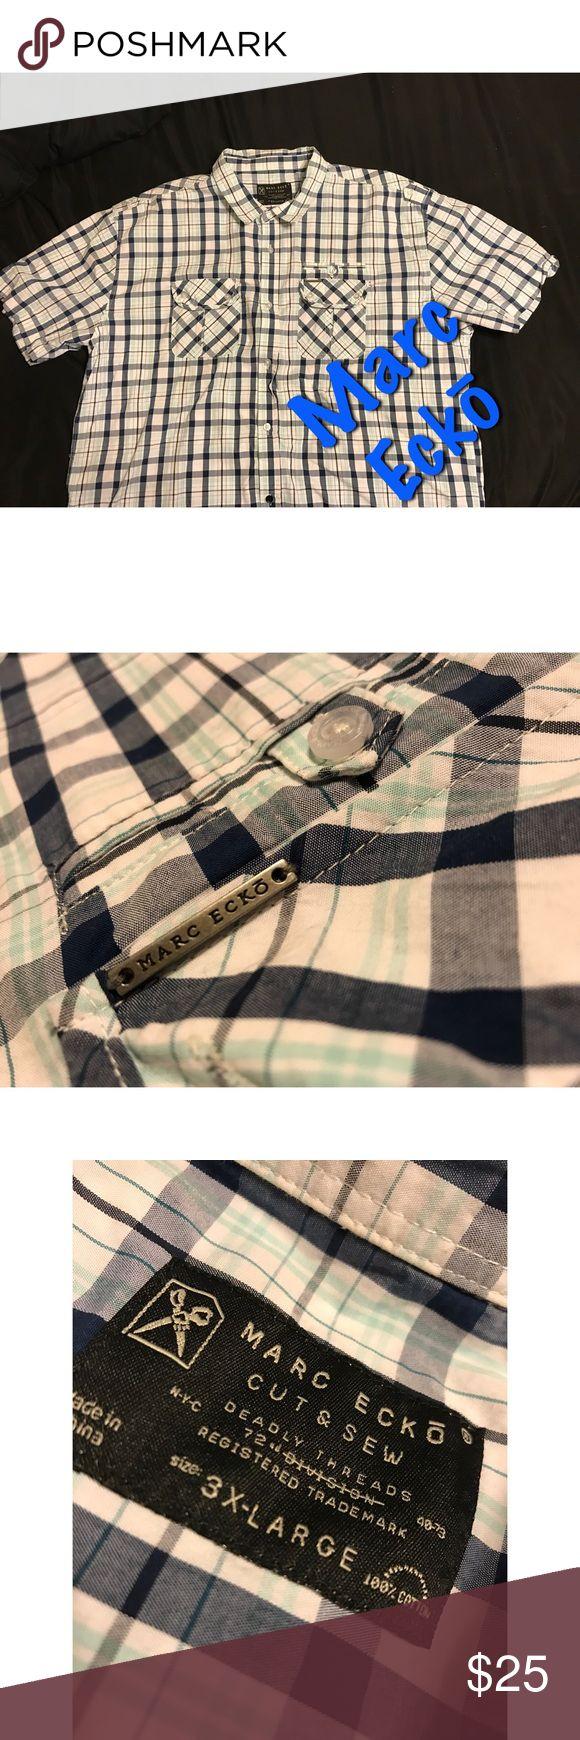 Men's Short Sleeve Button Down Marc Eckō, White & Blue Checkered Button Down, 100 % Cotton, 3XL Marc Eckō Shirts Casual Button Down Shirts